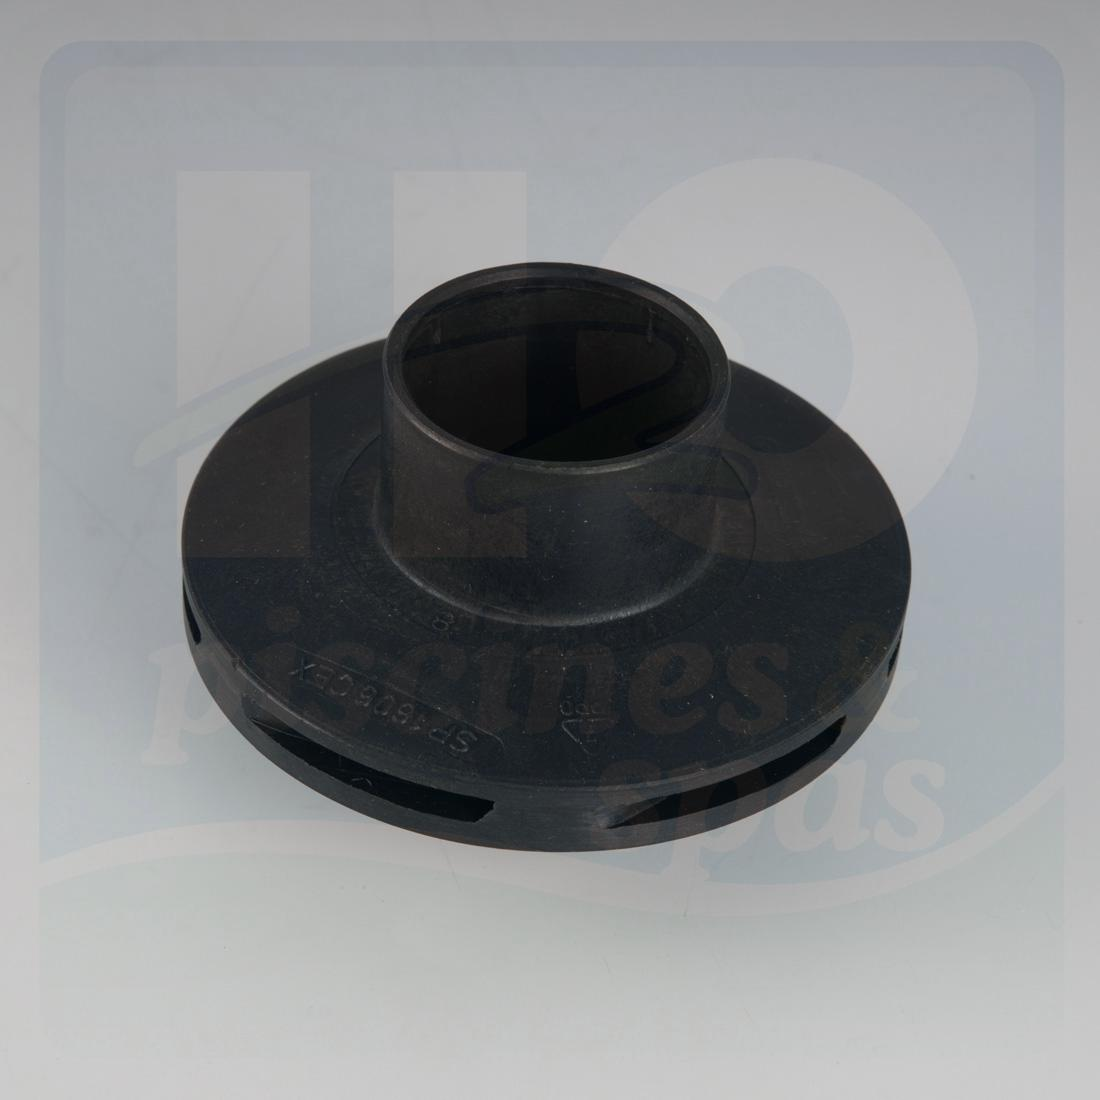 turbine de pompe hayward max flo super pump 1 2 cv h2o piscines spas. Black Bedroom Furniture Sets. Home Design Ideas